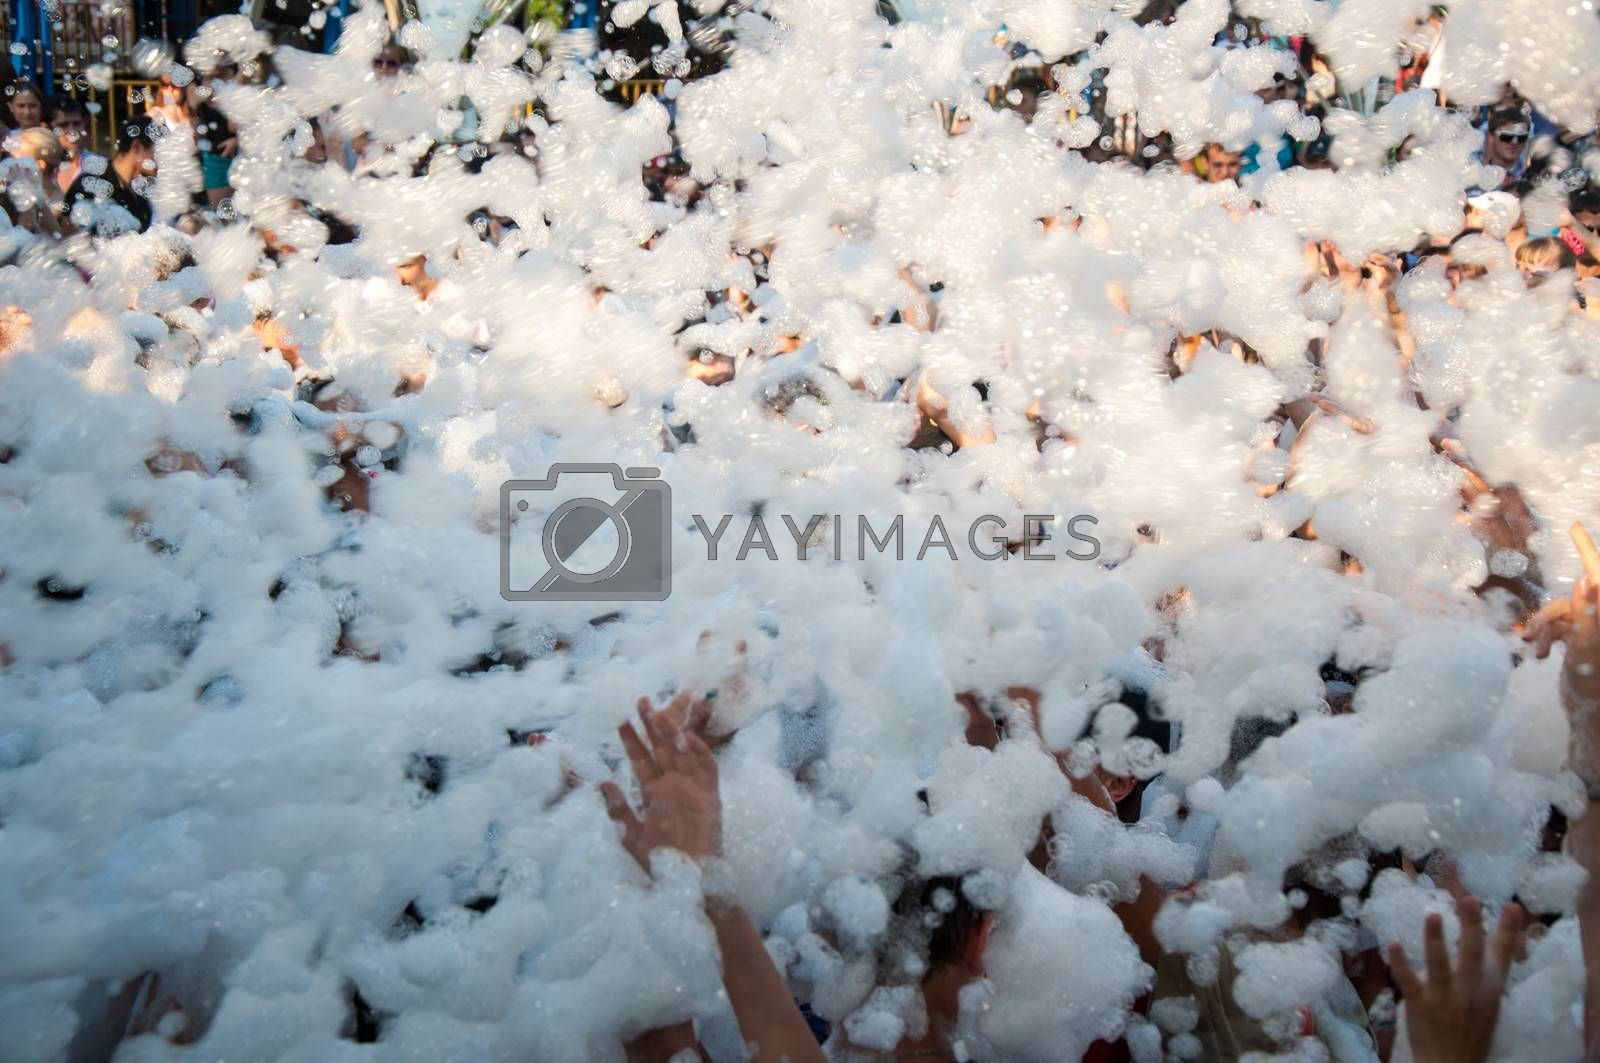 Summer. Heat. Refreshing shower foam. Holiday Ivan Kupala Park in Poplar , city of Orenburg